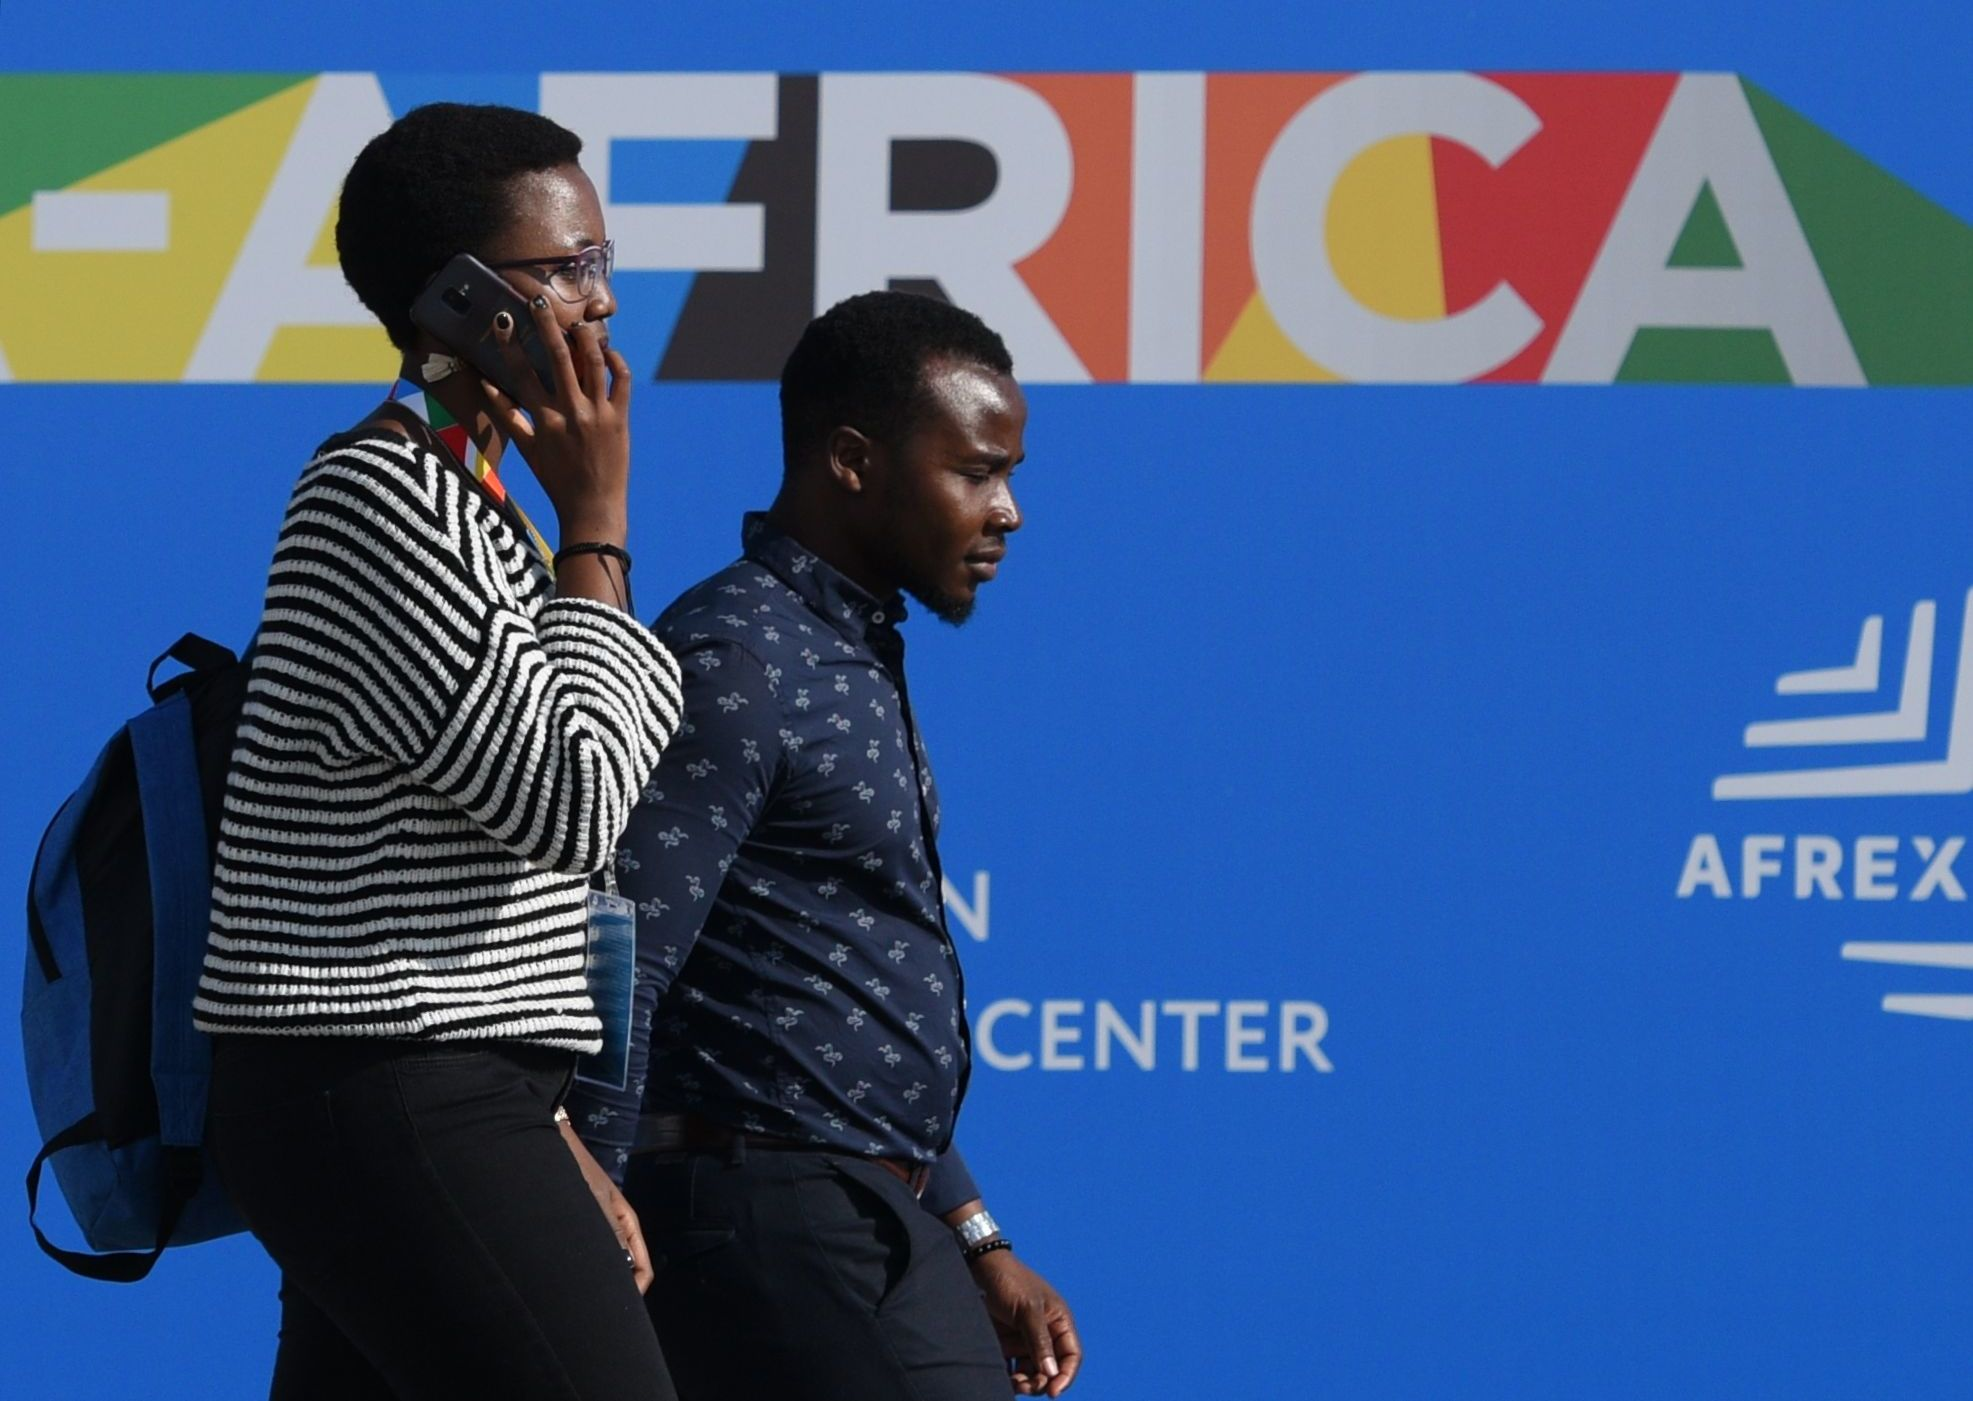 Russia-Africa Economic Forum Participants